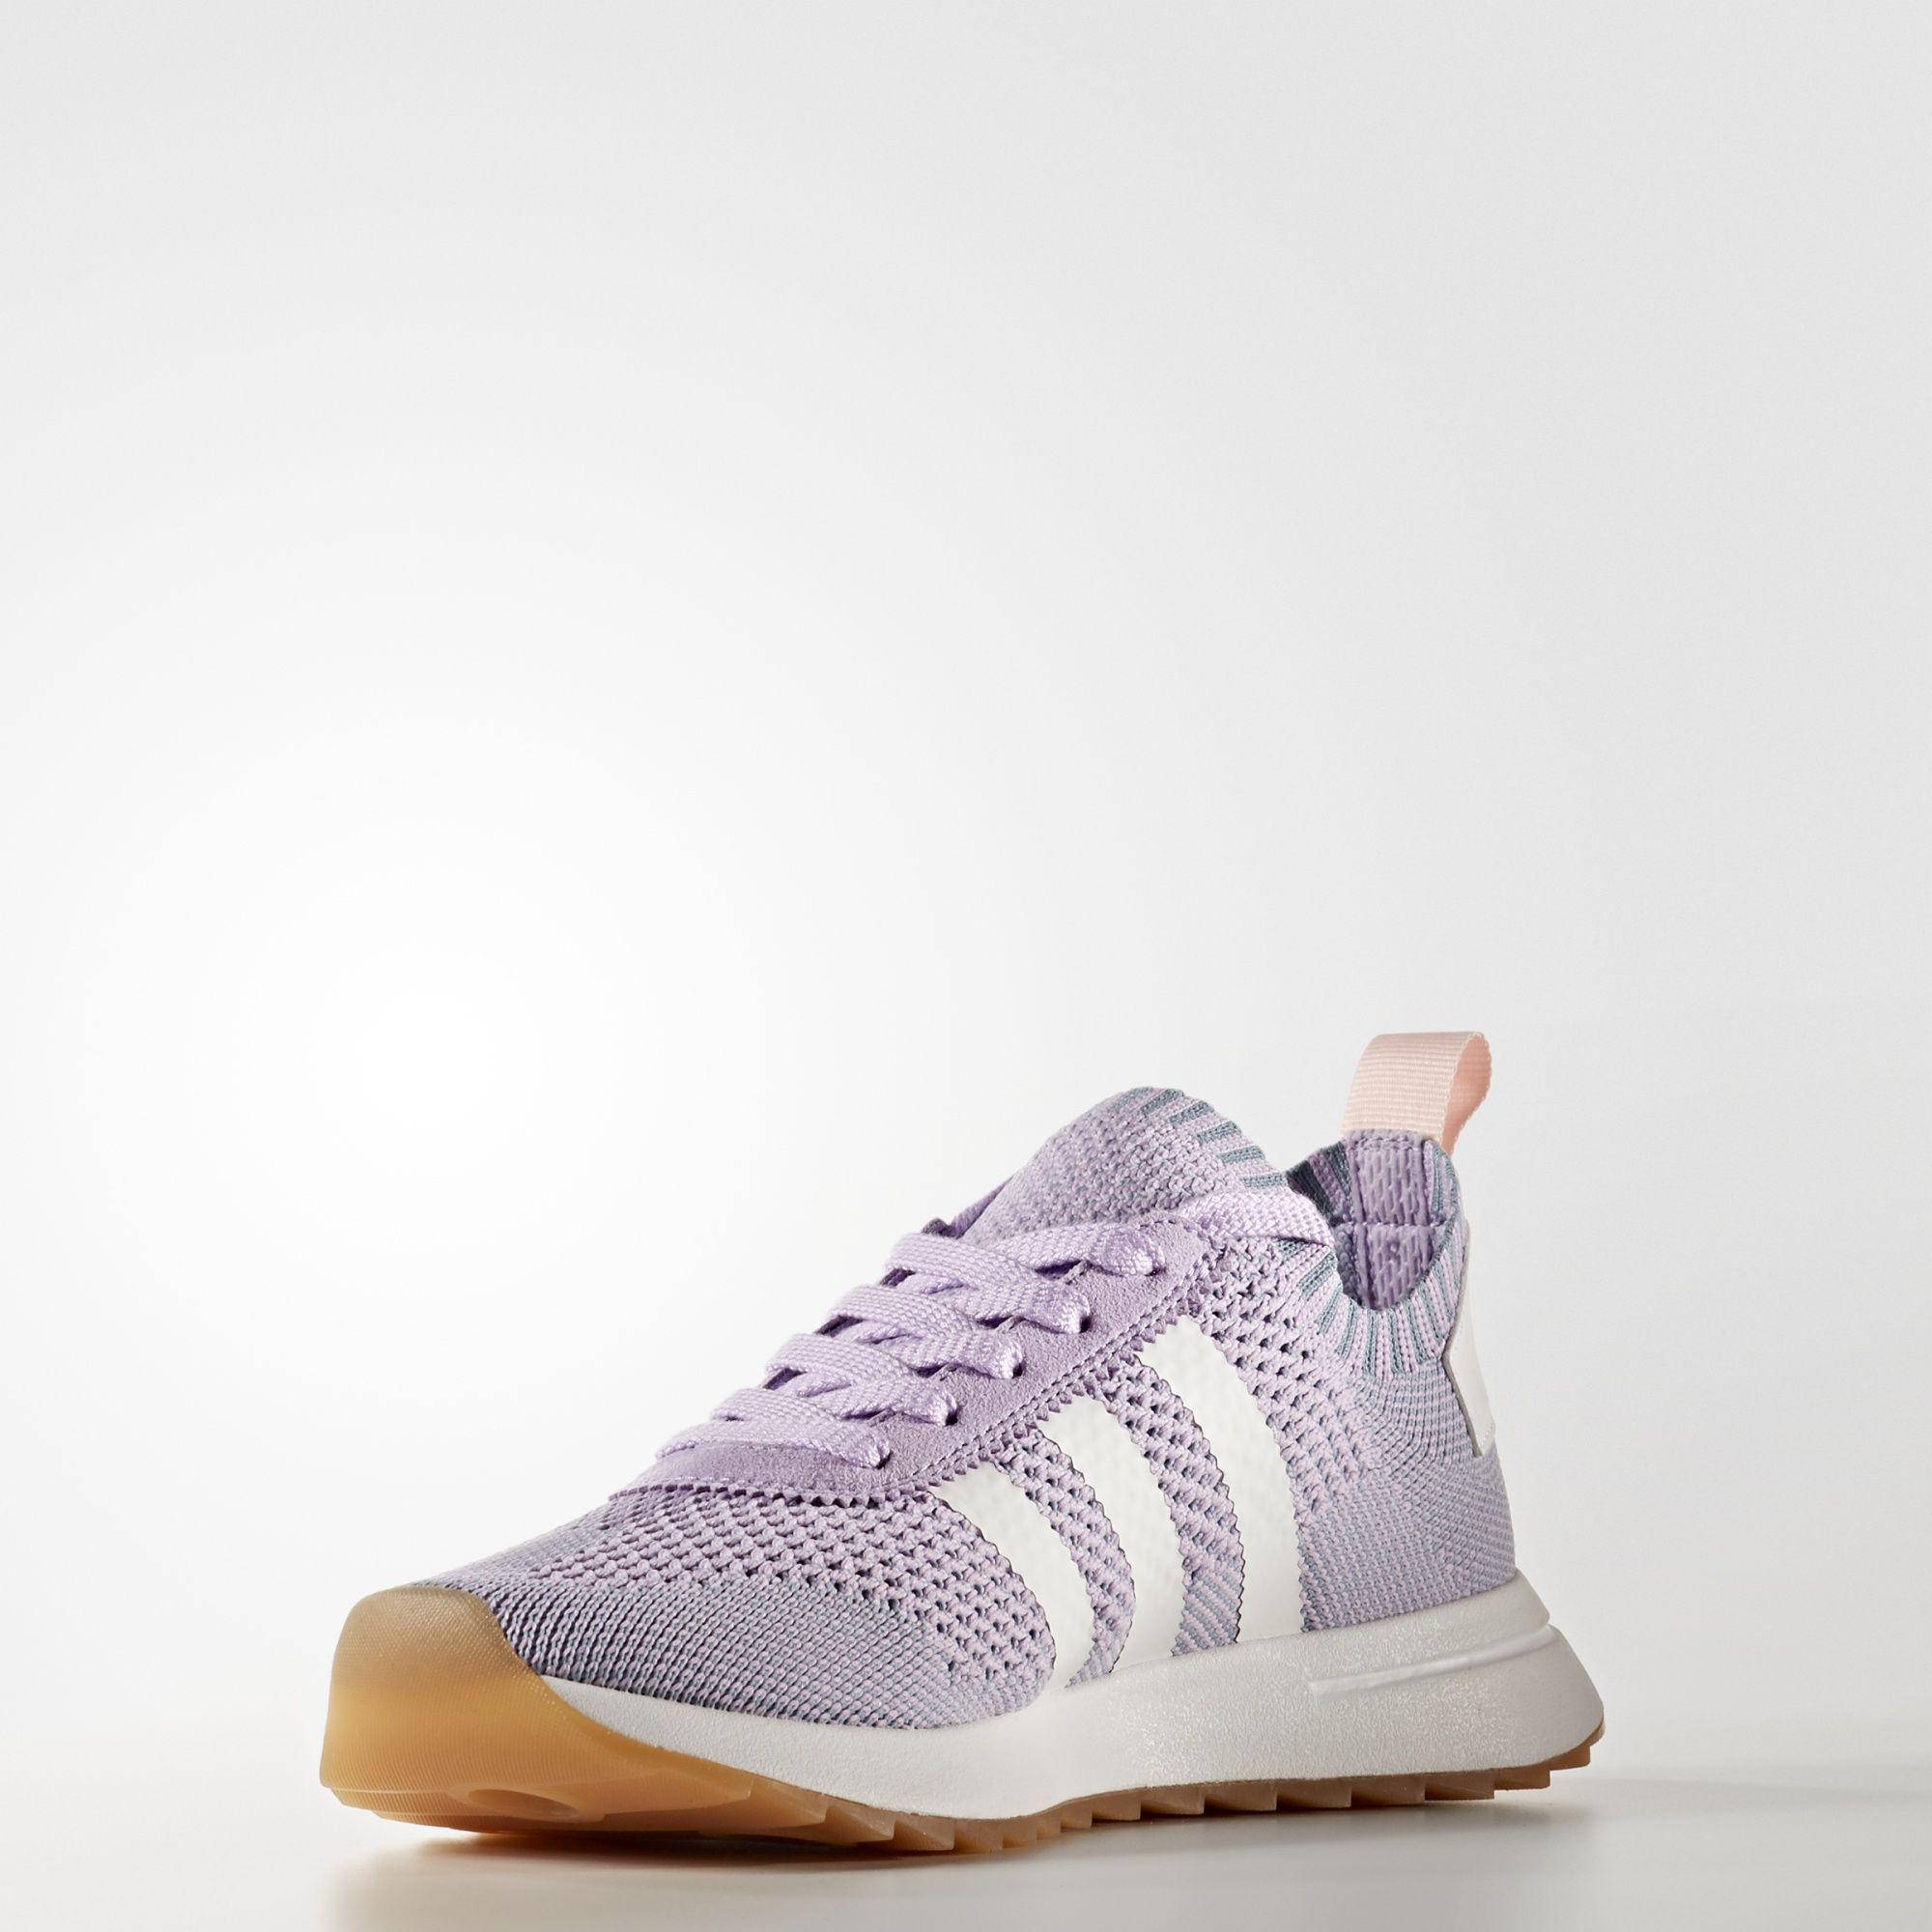 Adidas flashback primeknit donne alte scarpe adidas, viola